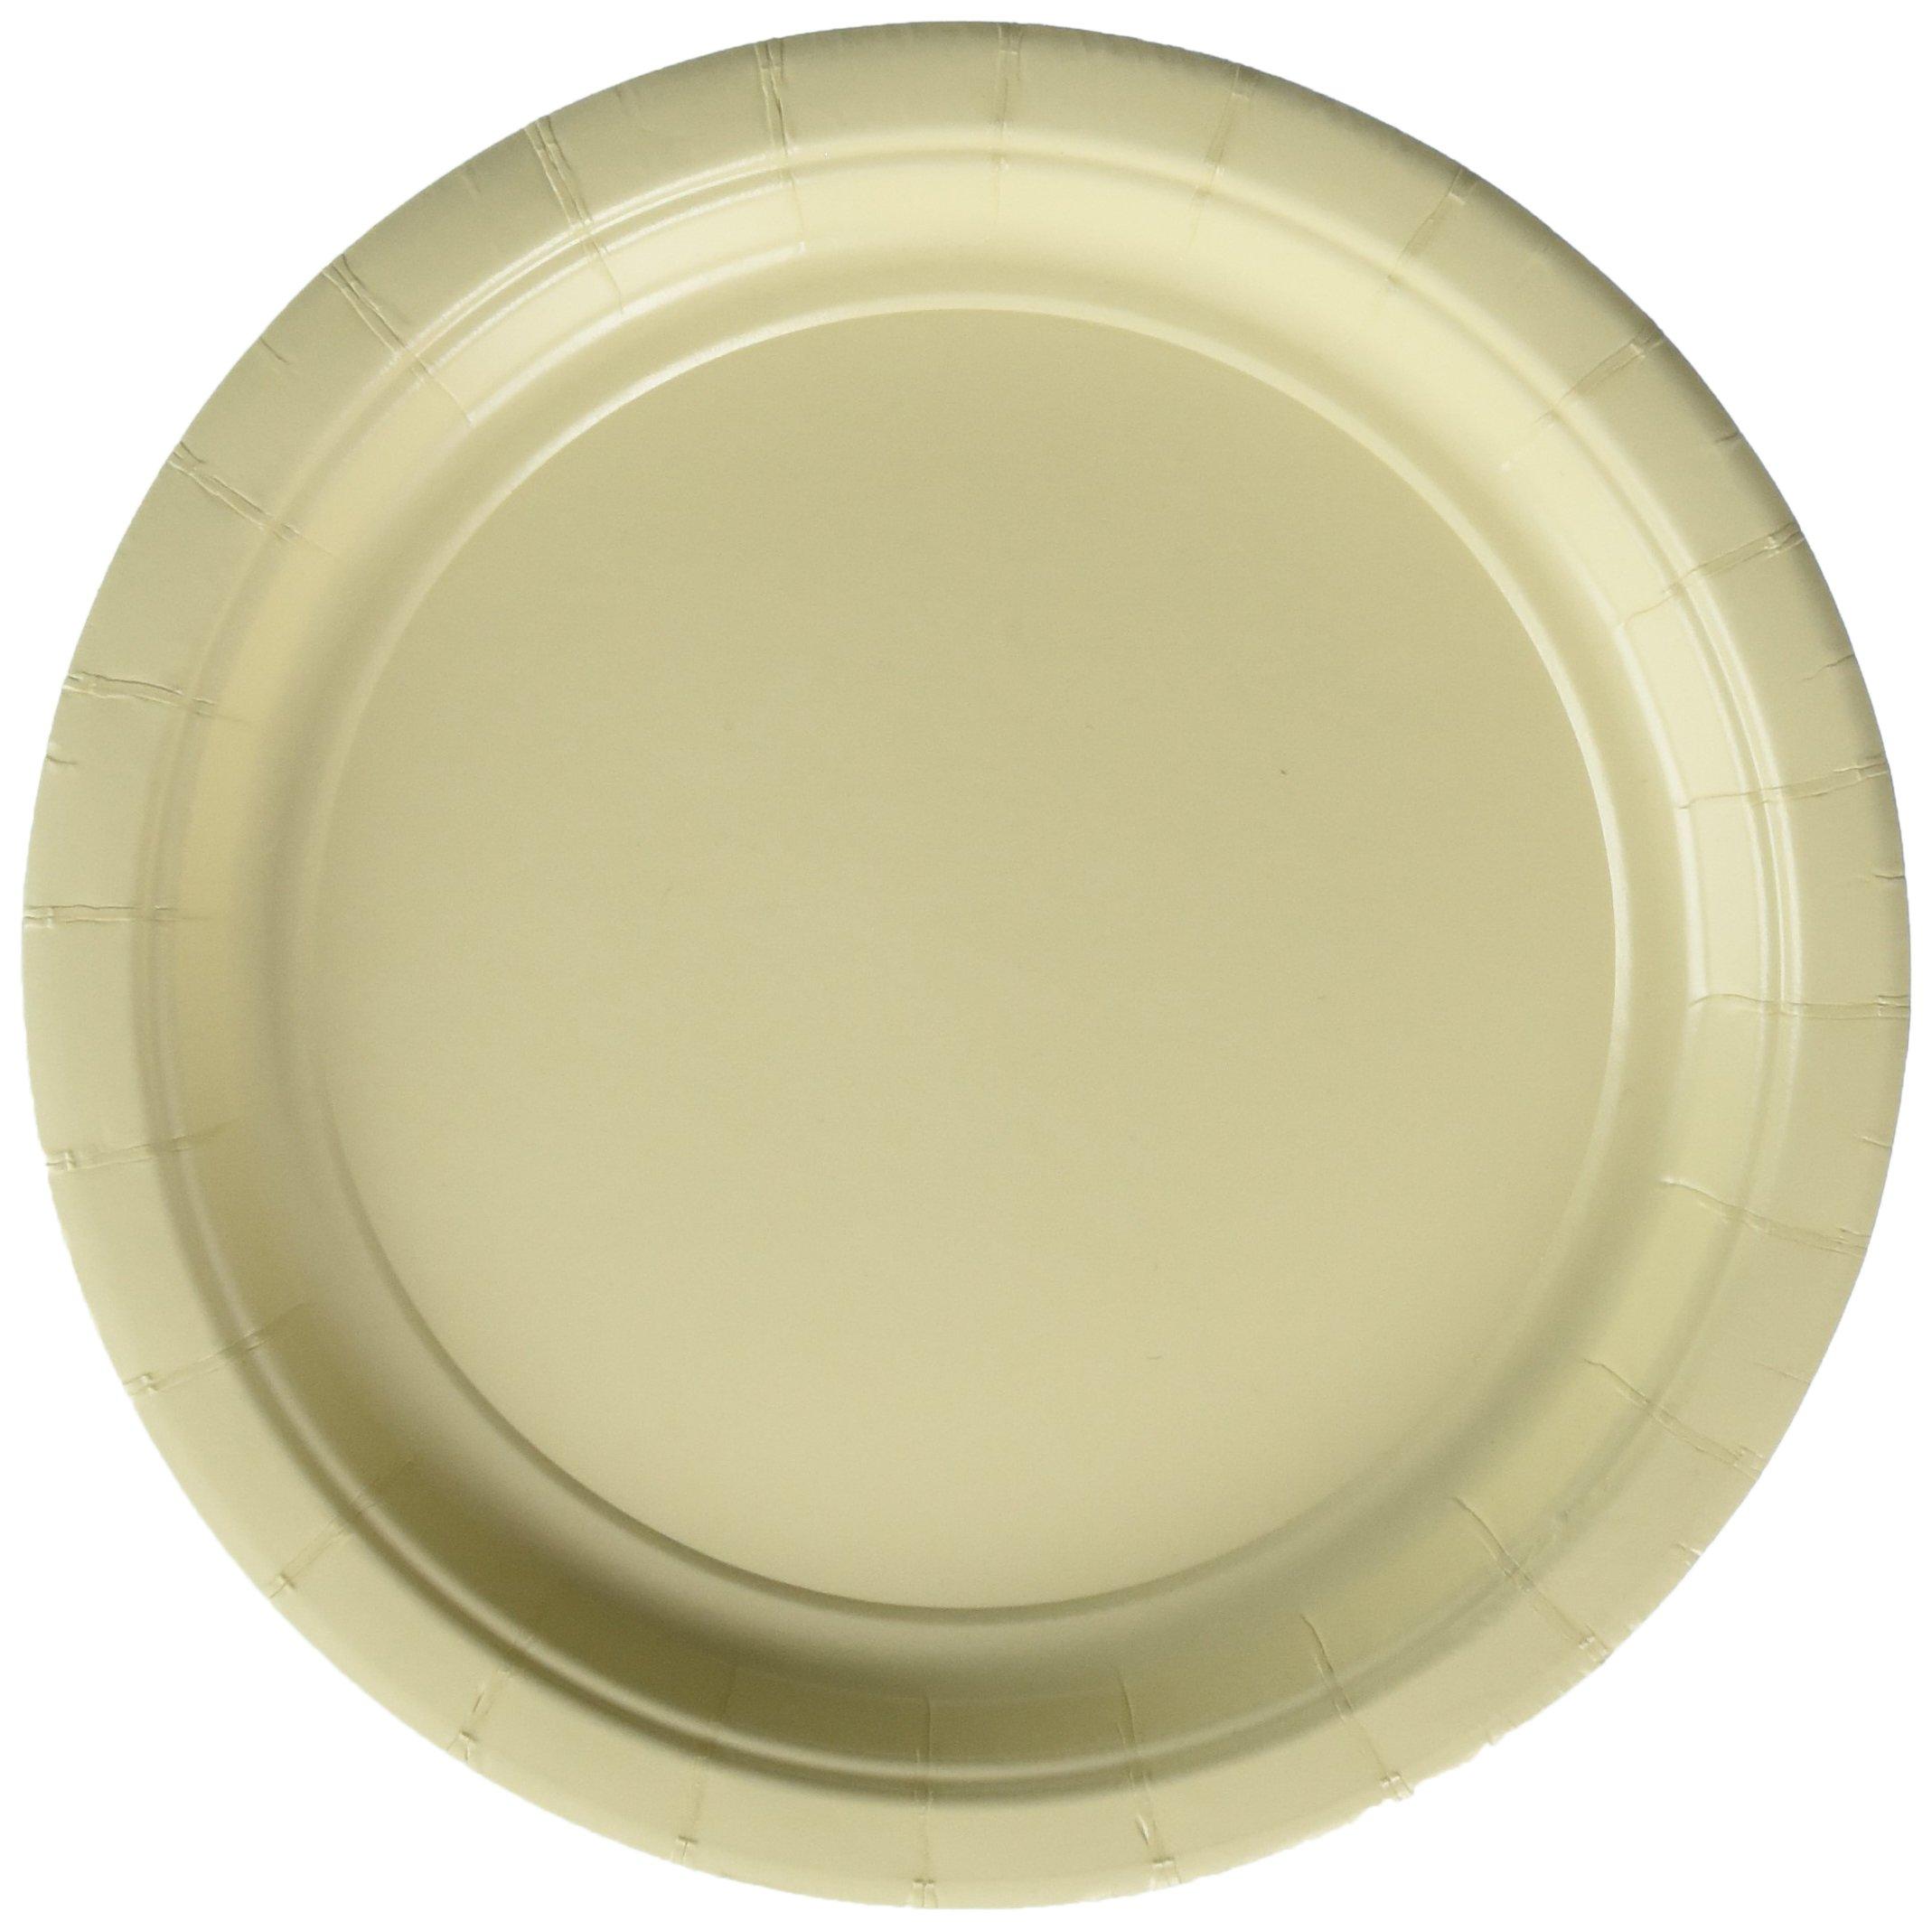 Amscan Durable Round Dessert Plates Big Bundle Party Tableware Paper, 7'', Pack of 50 Childrens, Vanilla Crème, 7''